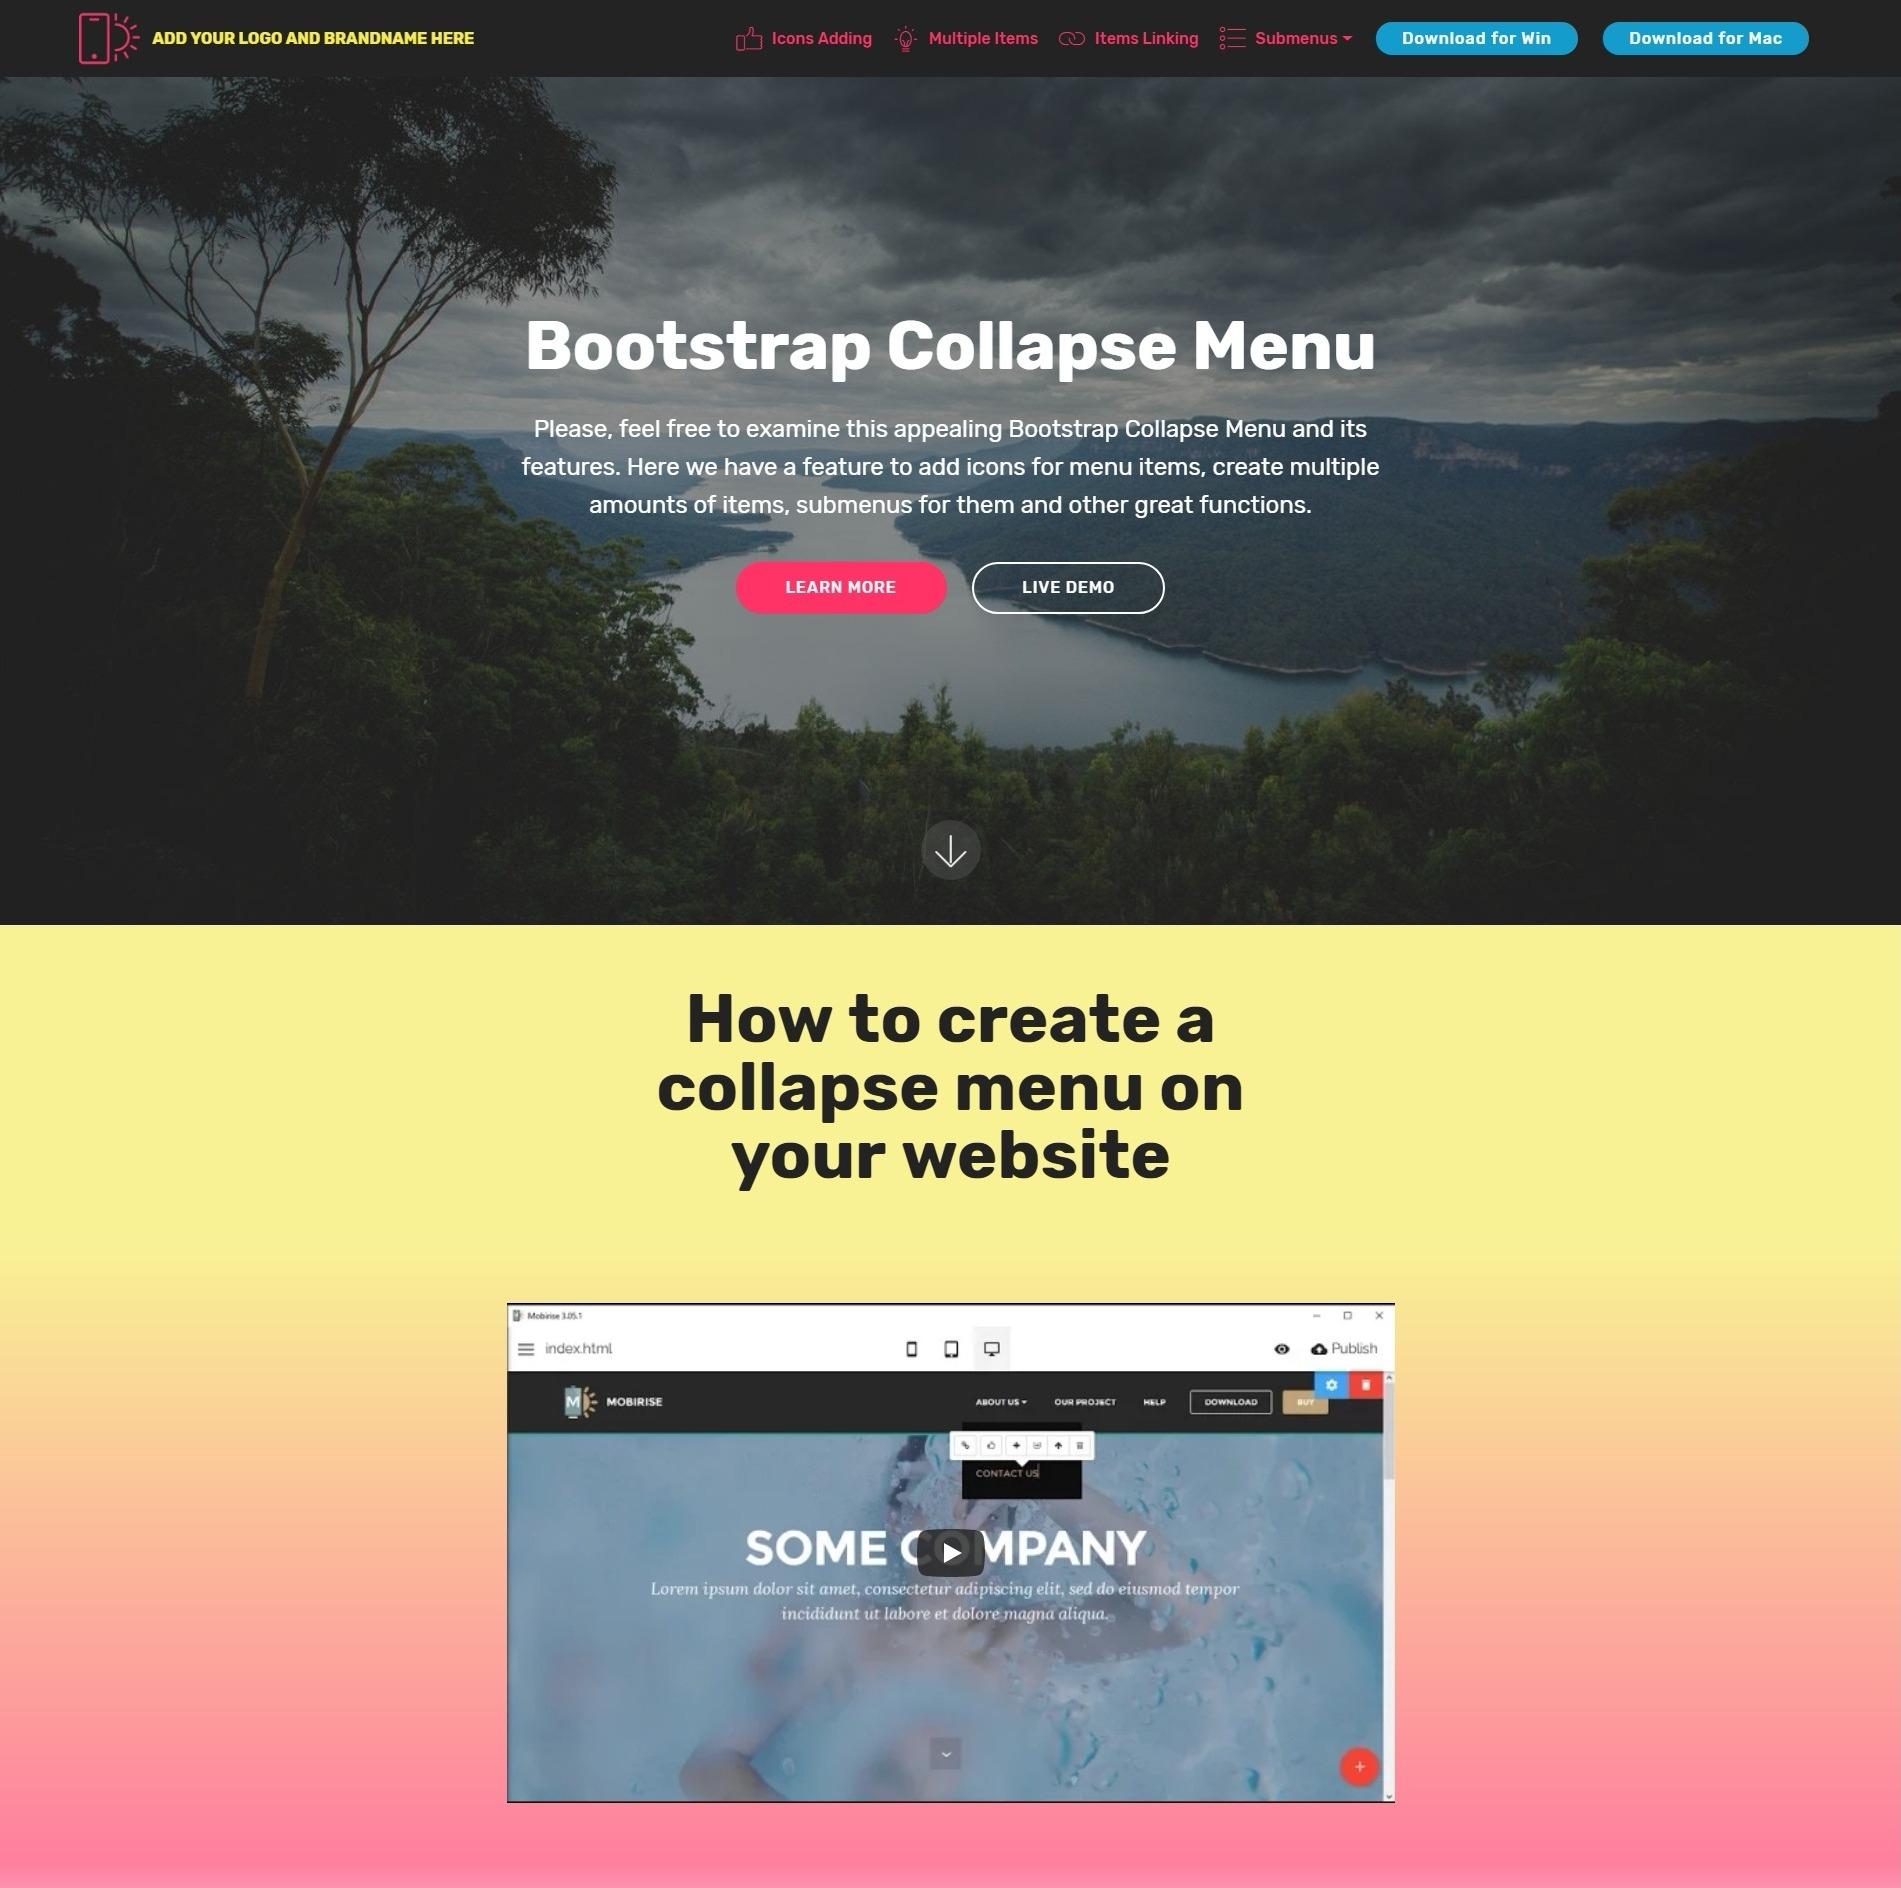 Bootstrap Collapse Menu